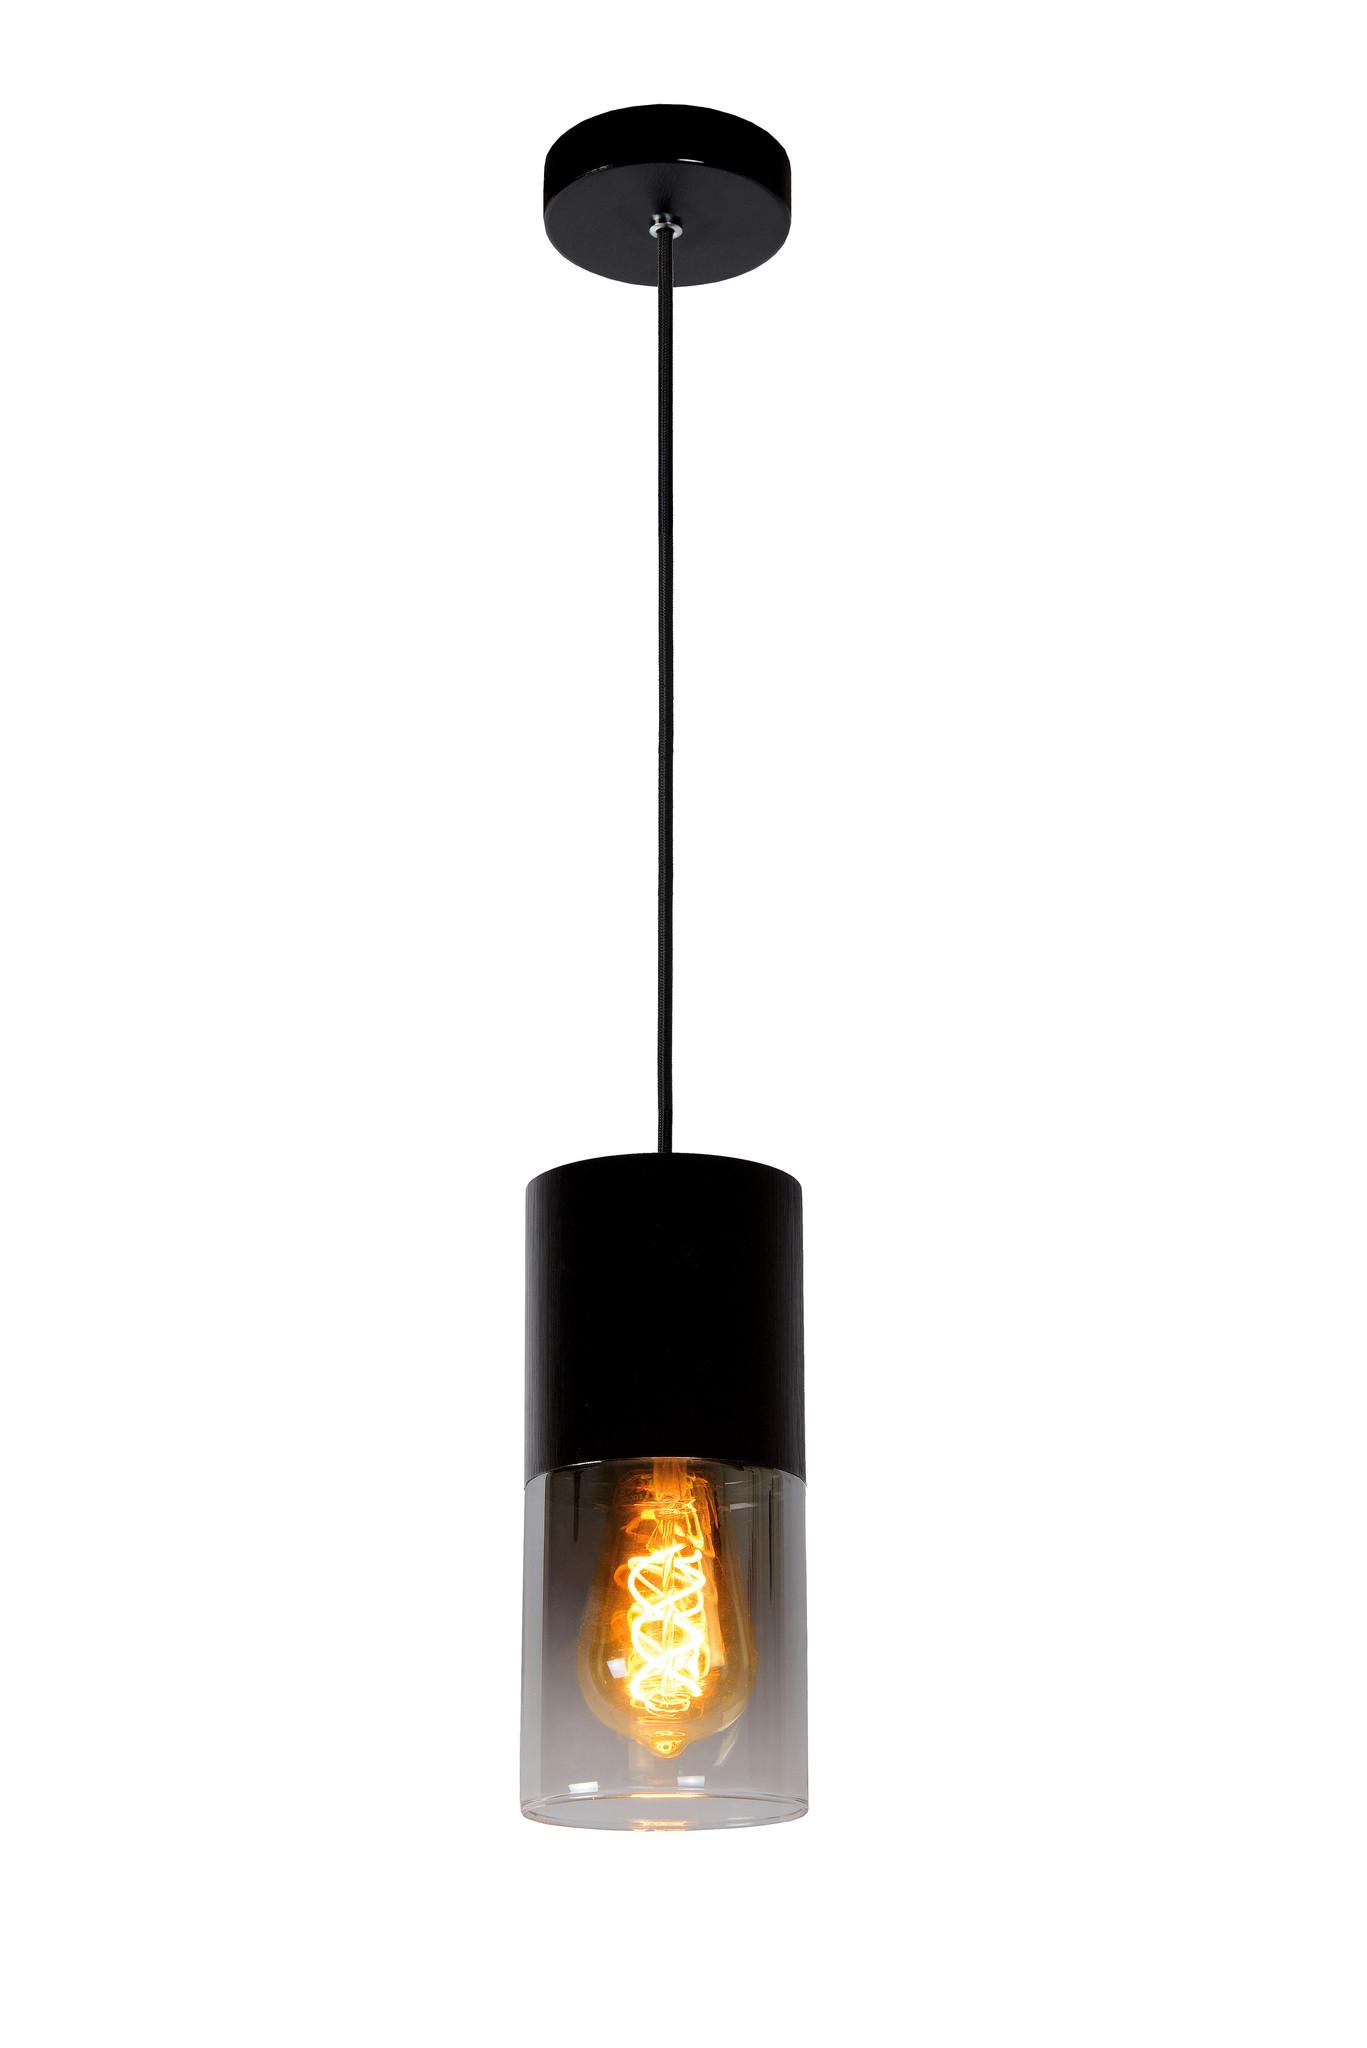 Lucide ZINO Hanglamp-Zwart-Ø10-1xE27-60W-Glas